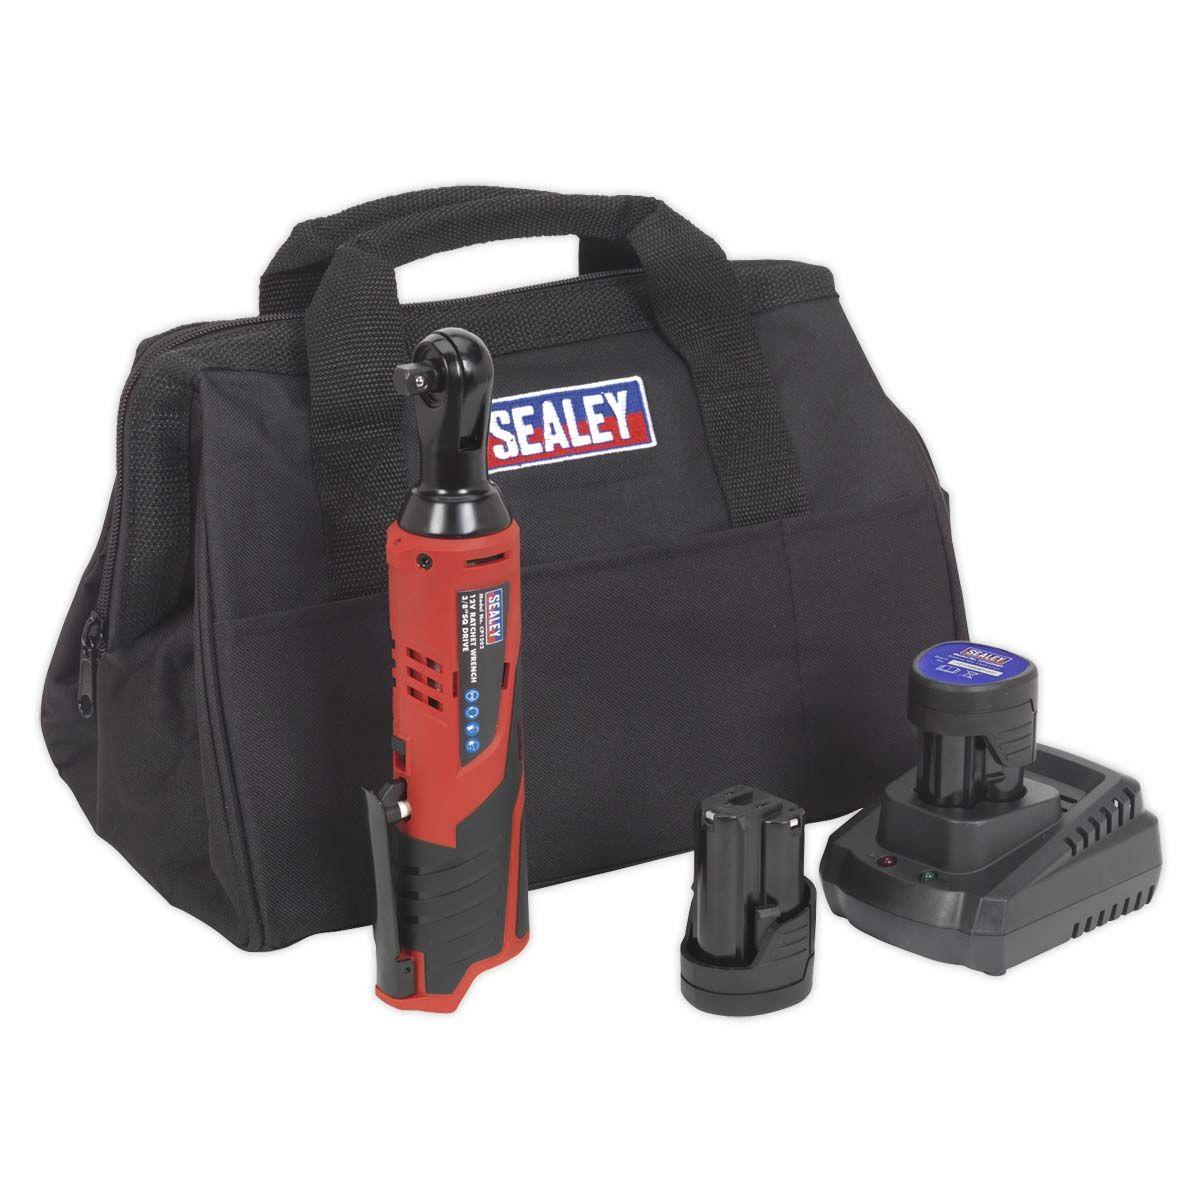 "Sealey Ratchet Wrench Kit 3/8""Sq Drive 12V Li-ion - 2 Batteries"